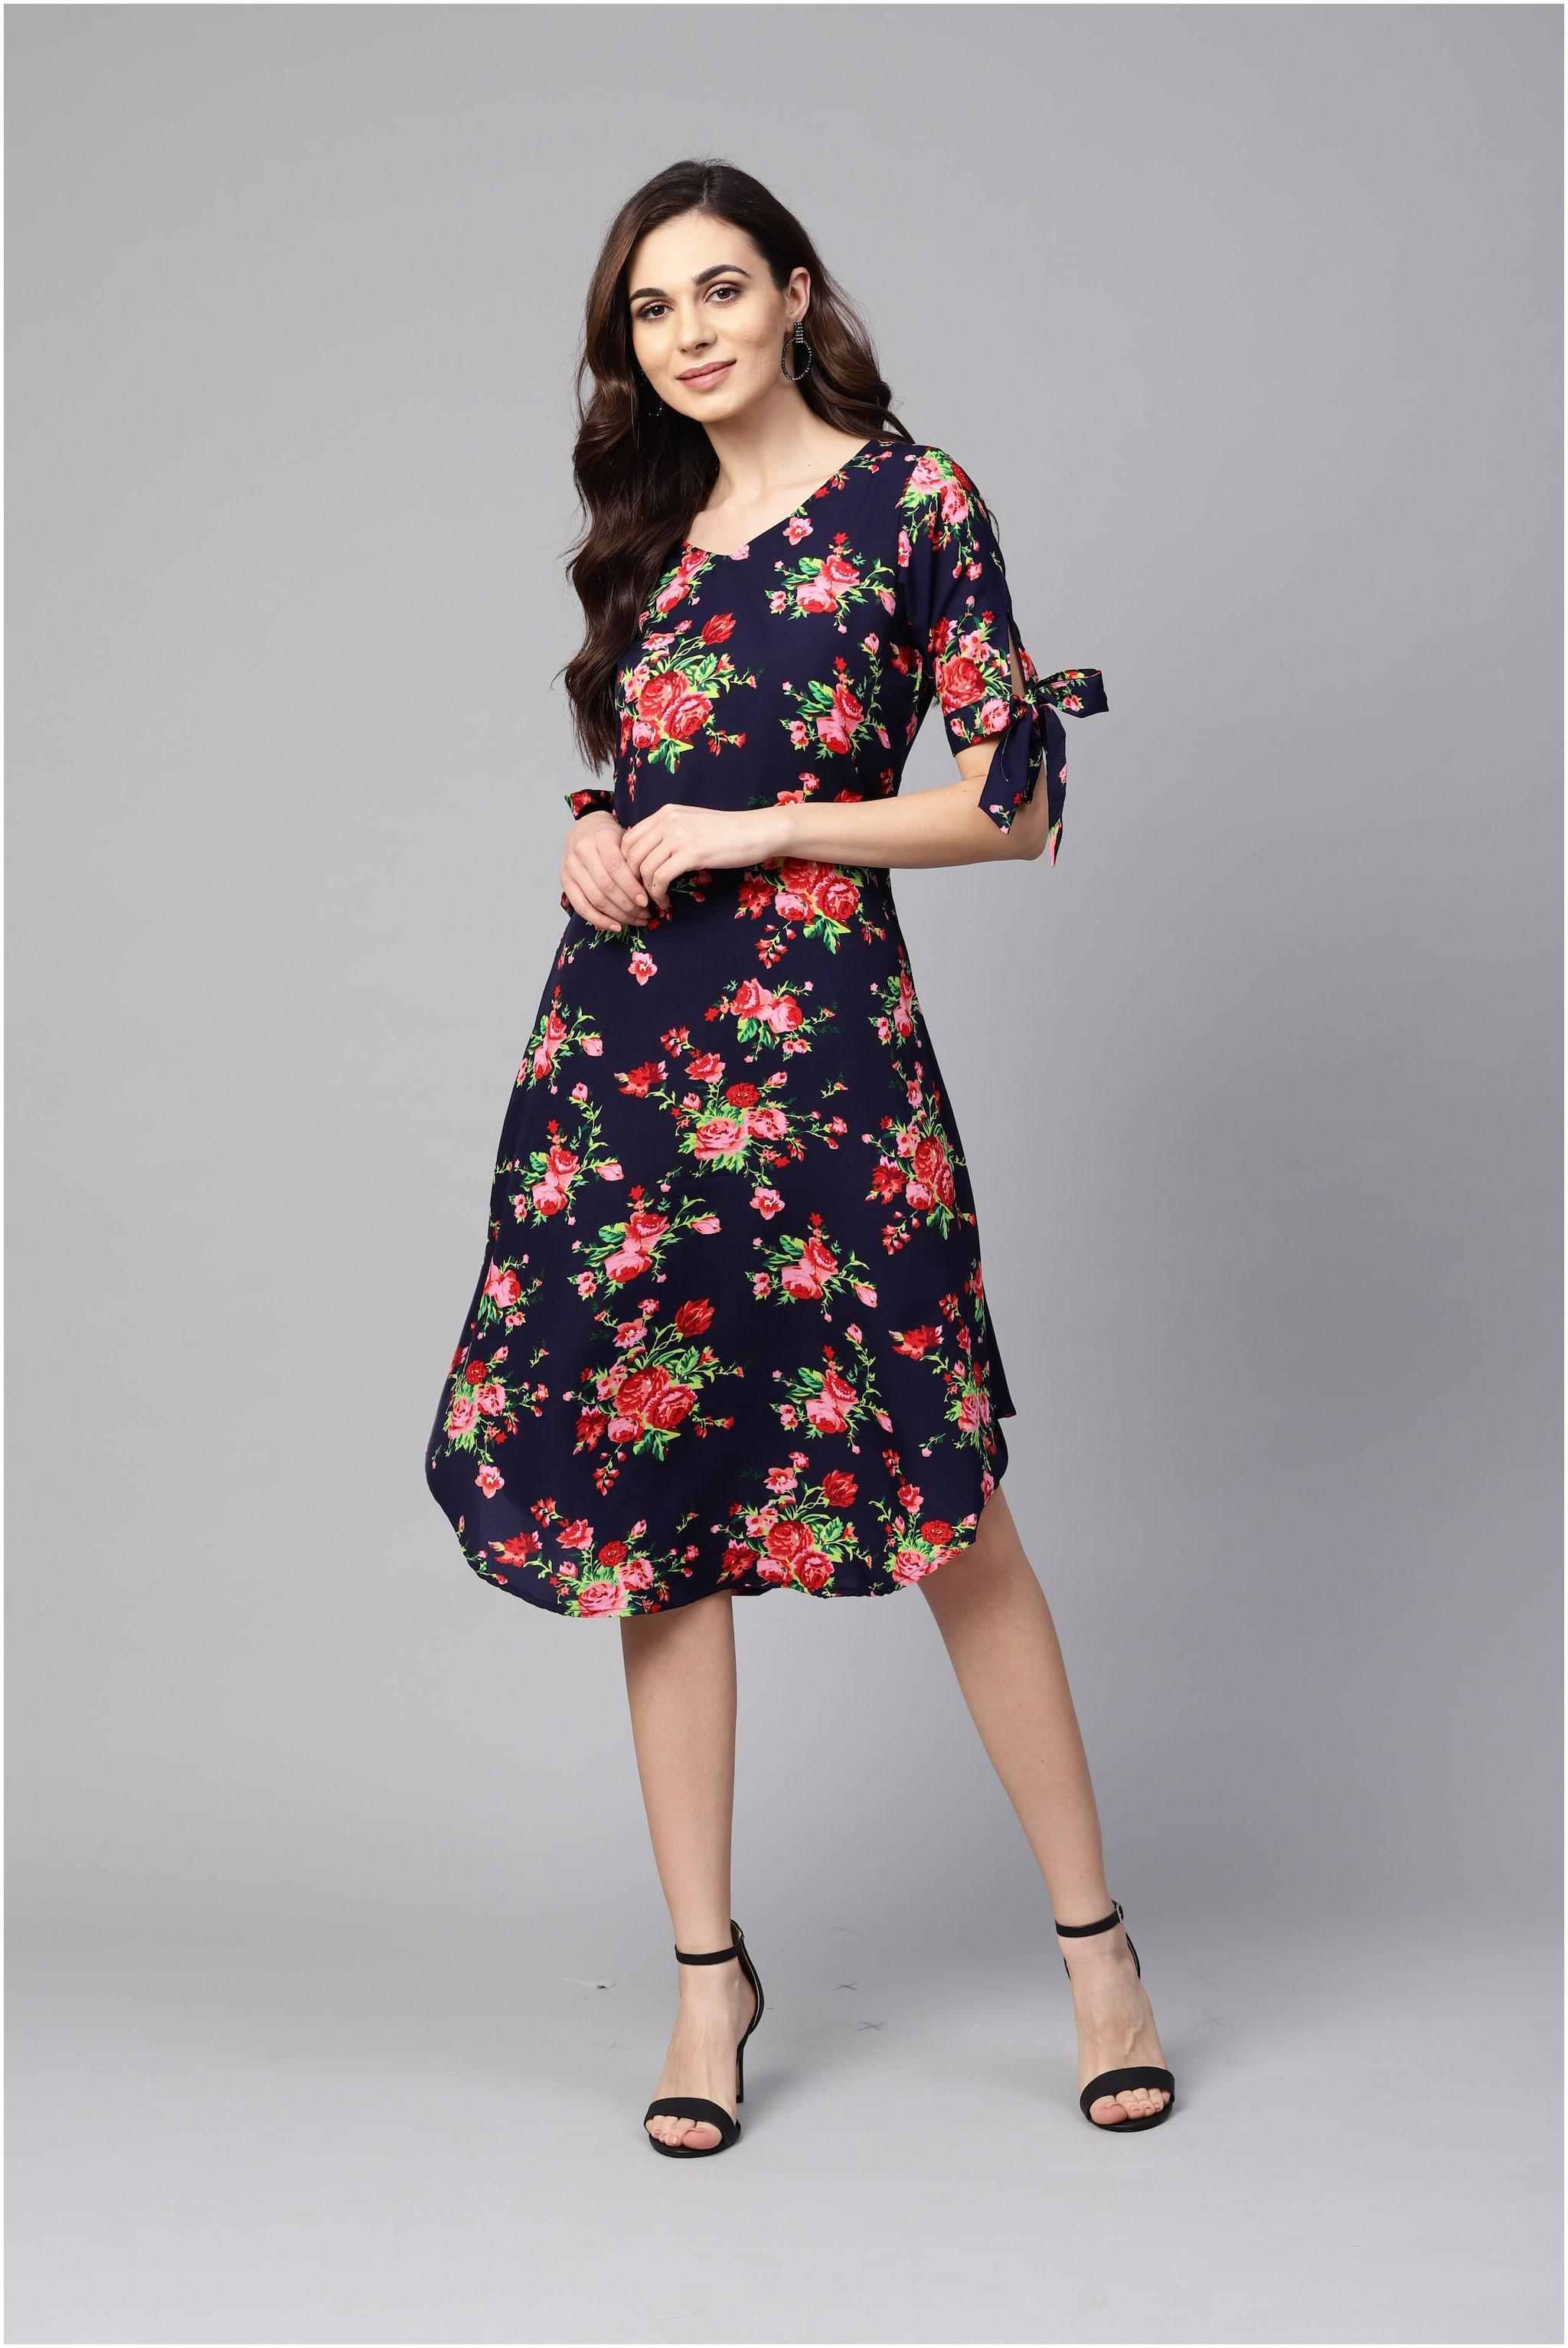 Myshka Polyester Party Midi Fit & Flare Dress Multi